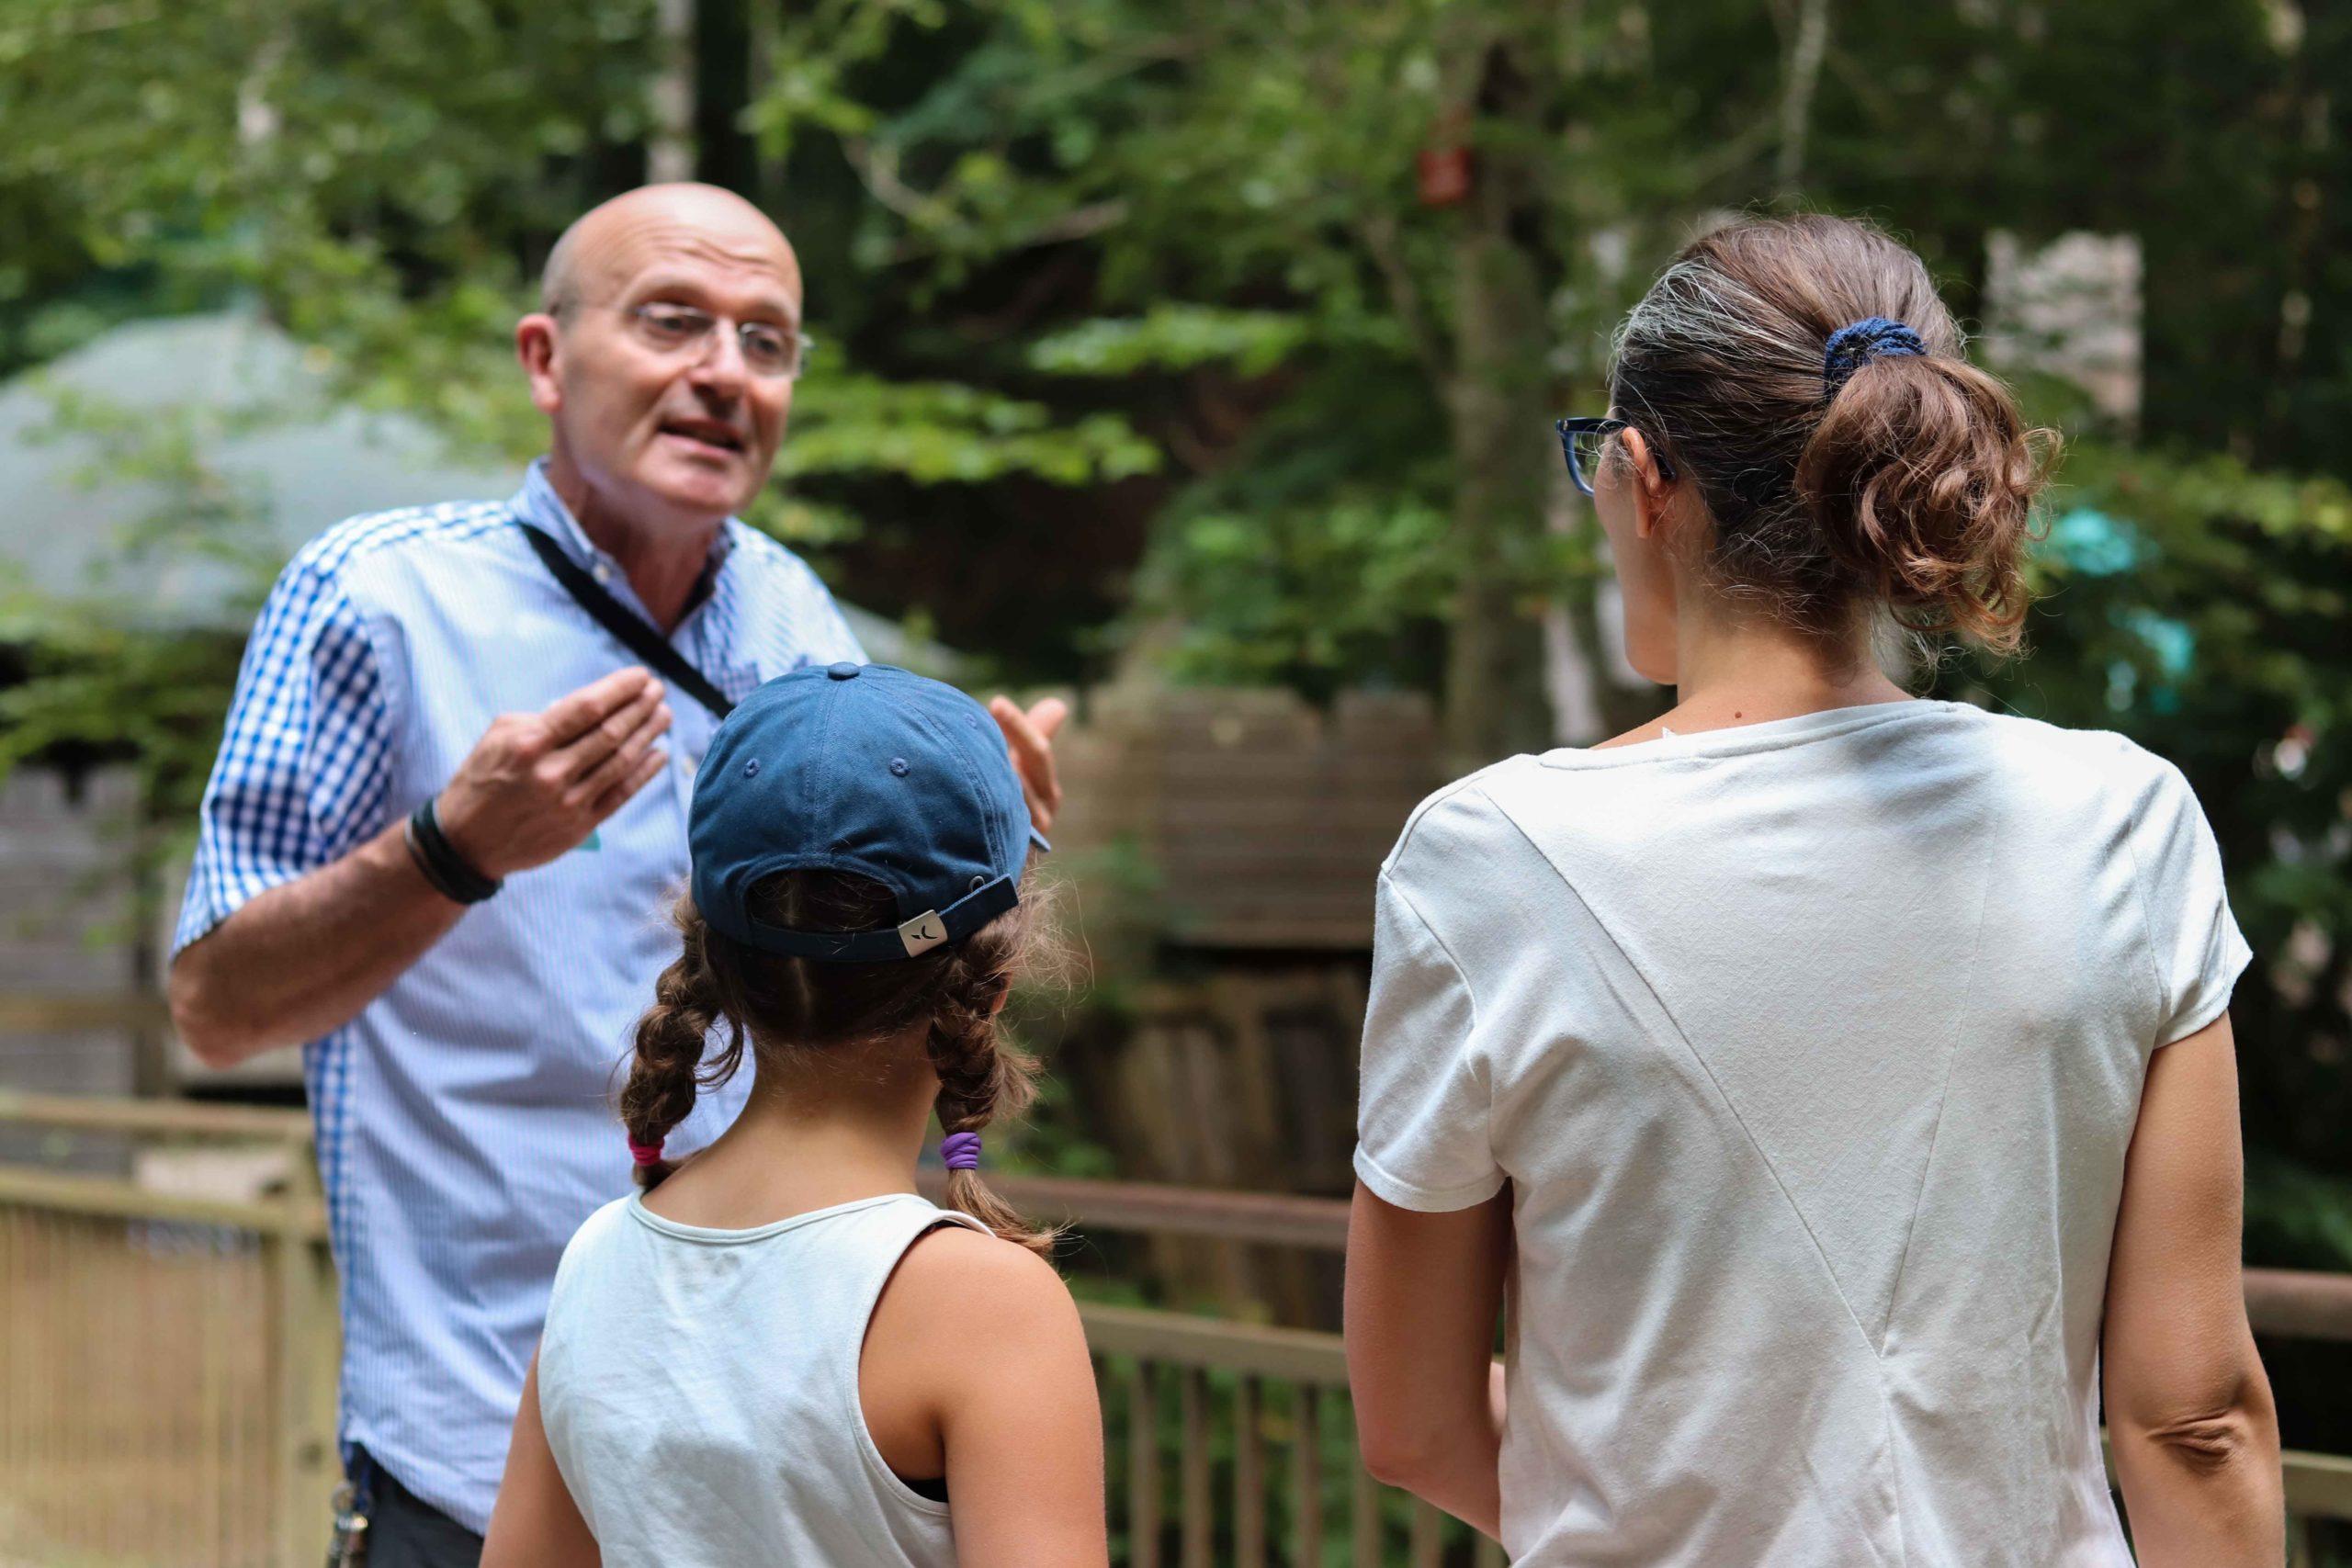 La Maison des Loups - Orlu - famille - Ariège tourisme